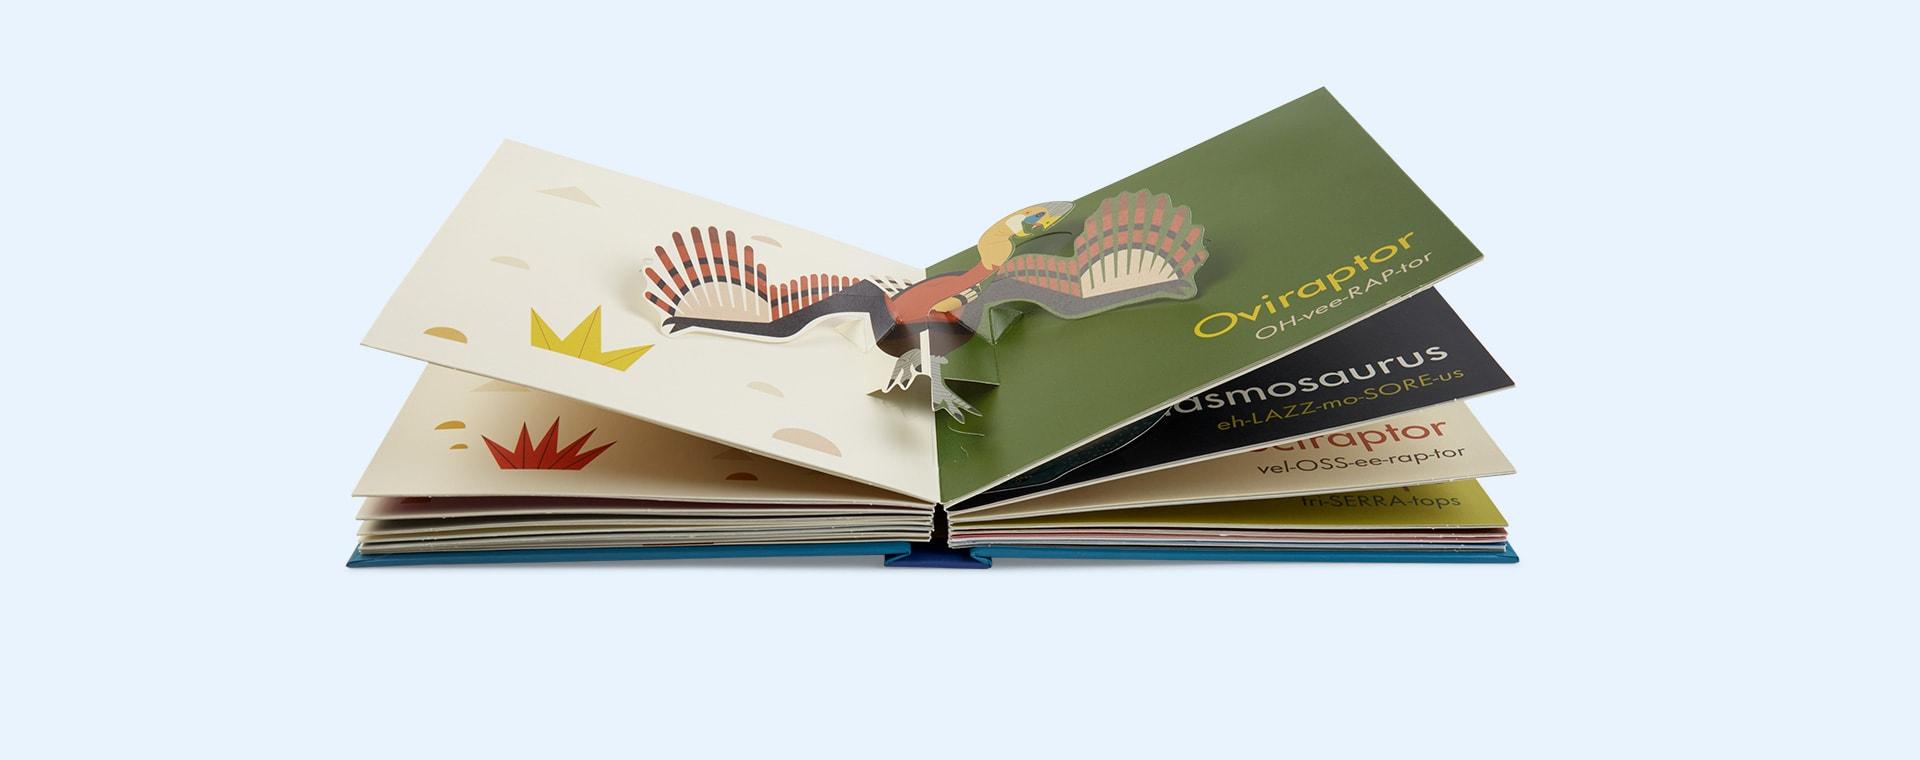 Blue bookspeed My First Pop Up Dinosaurs: 15 Incredible Pop Ups